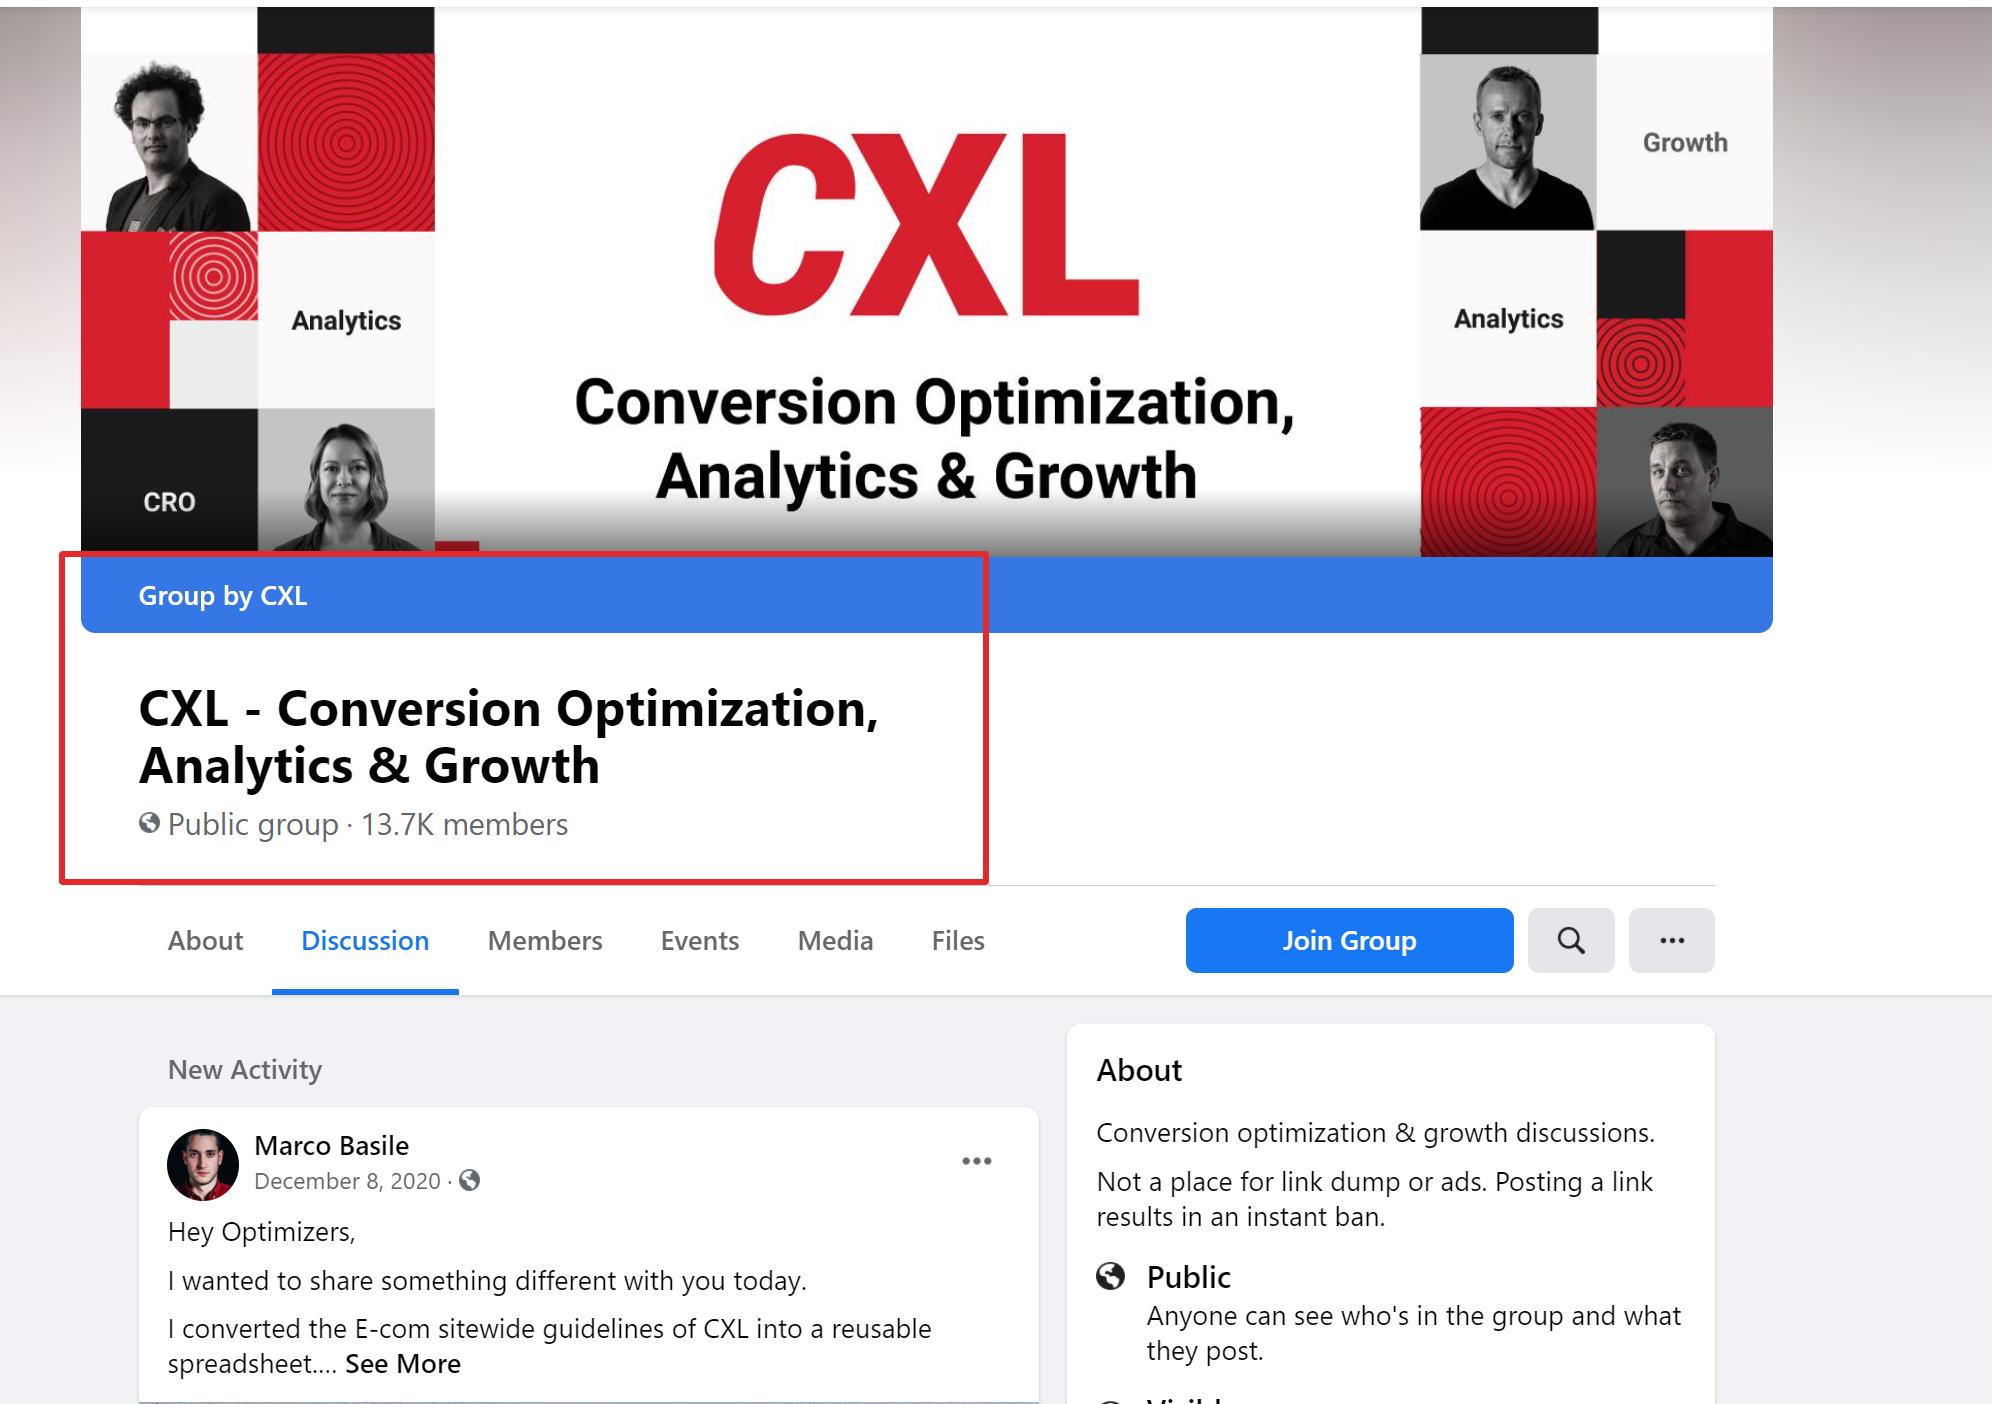 CXL - Conversion Optimization, Analytics & Growth